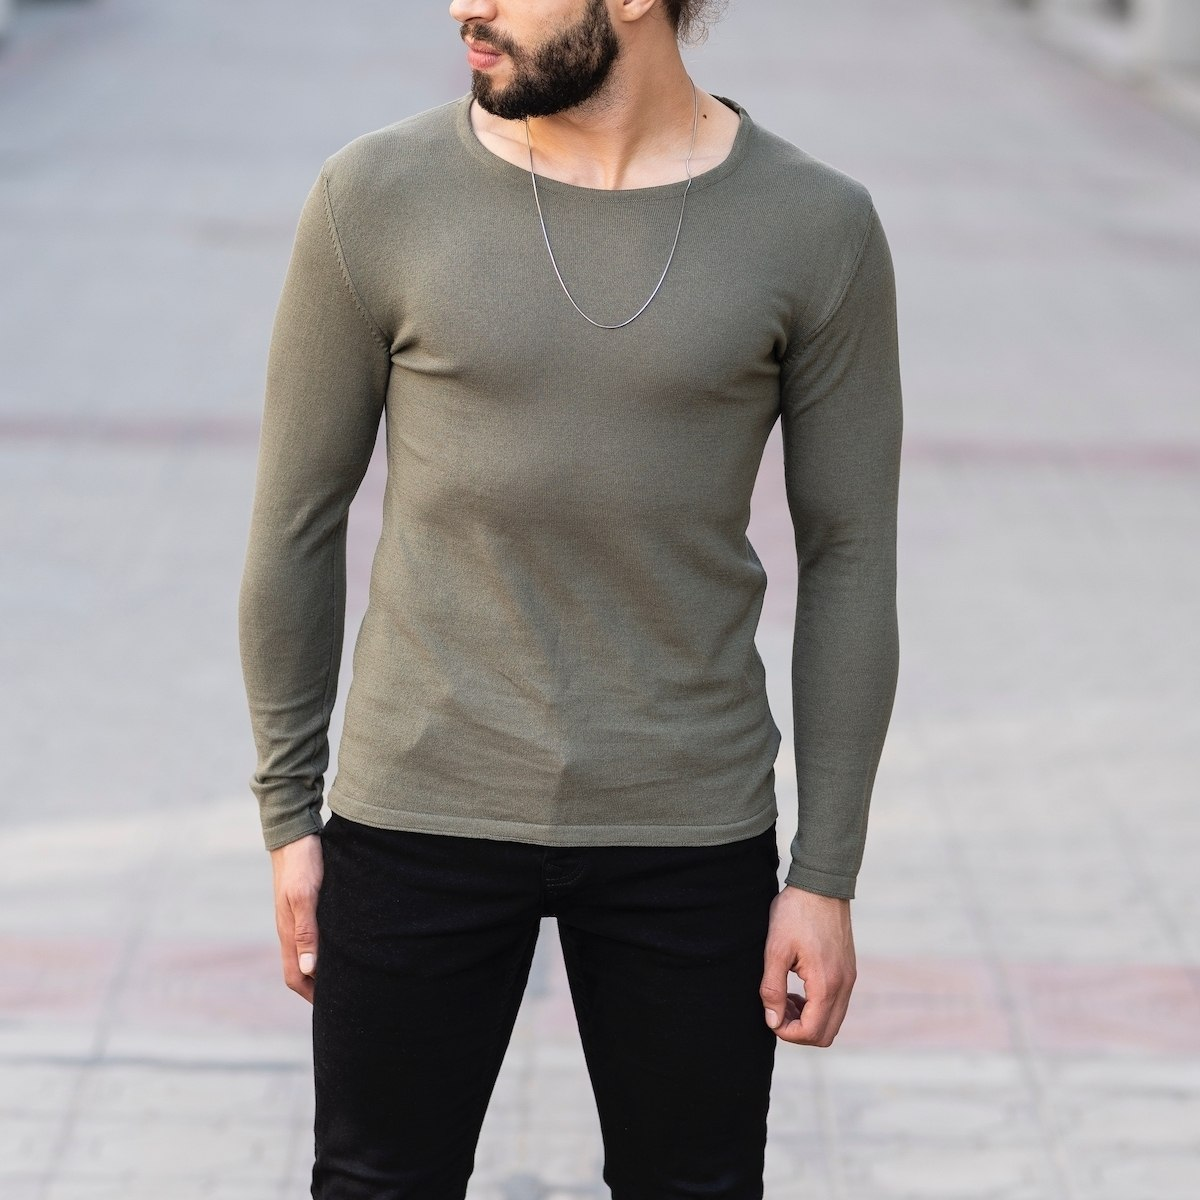 Slim-Fitting Classic Round-Neck Sweater in Khaki Mv Premium Brand - 1